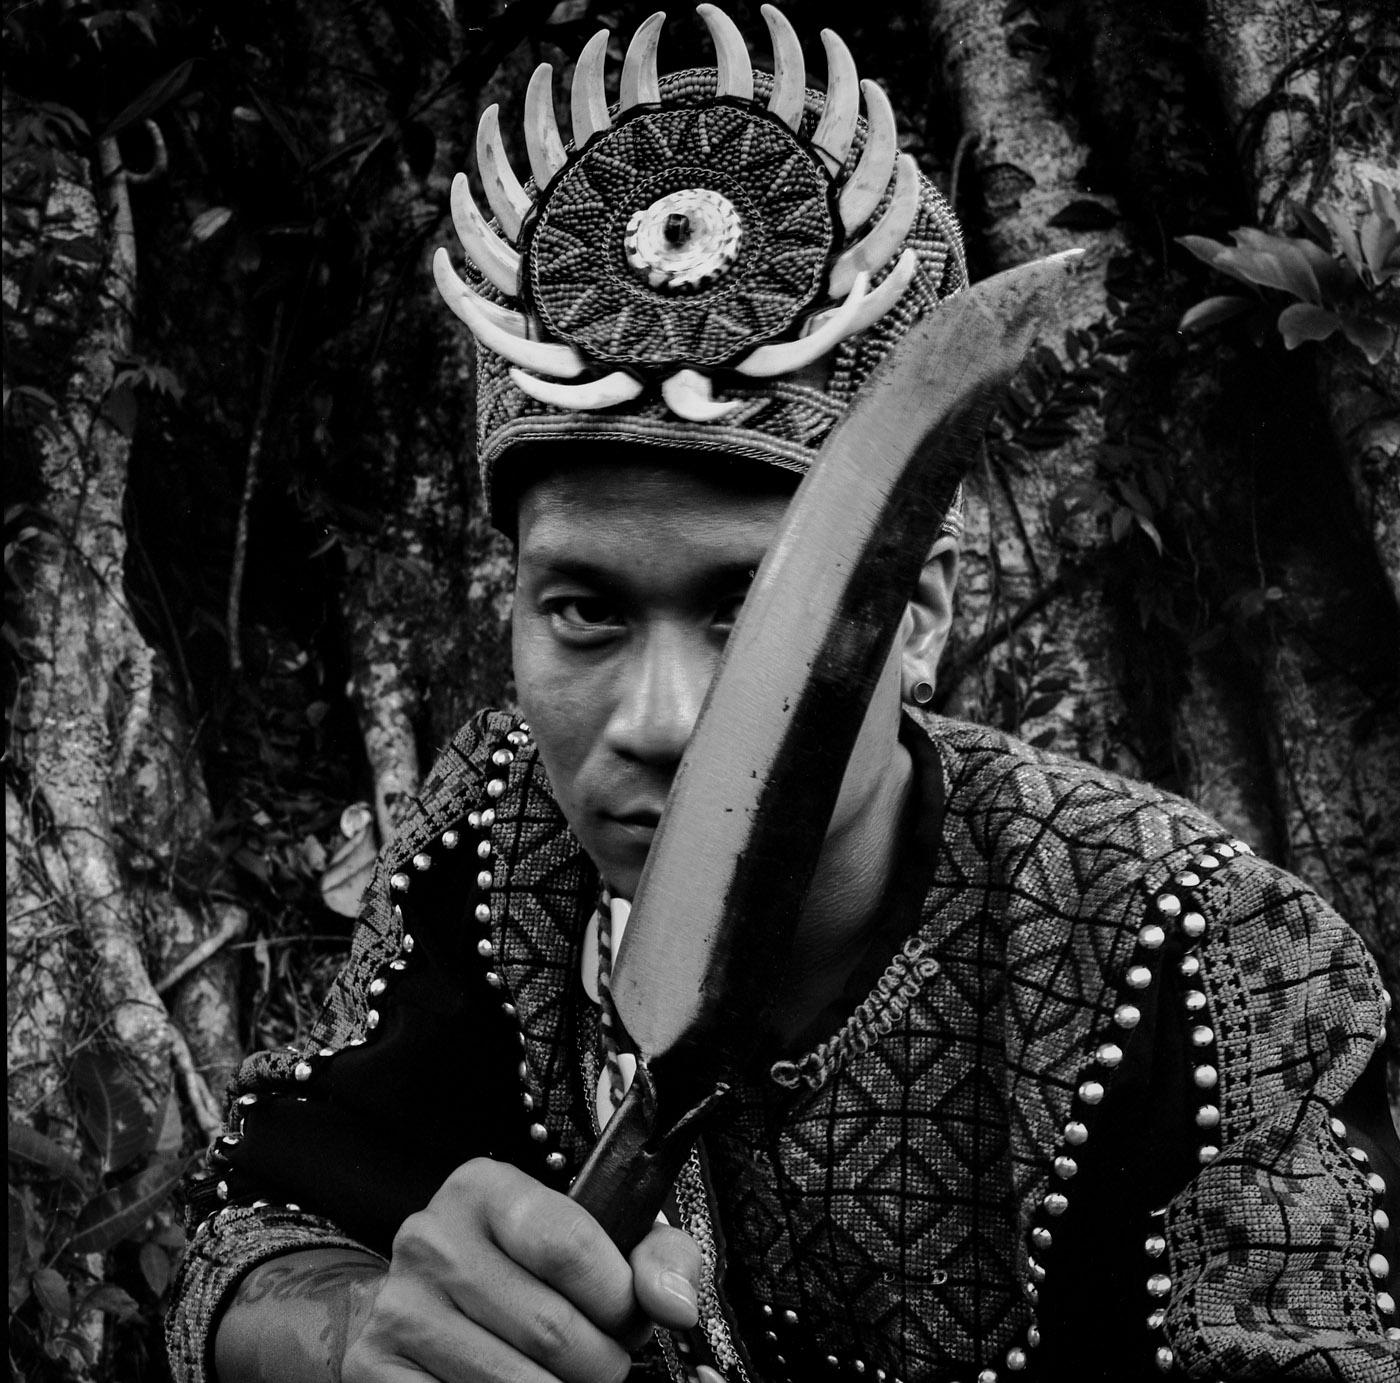 Hsuan_Chung_Formosa_Aborigines_08.jpg